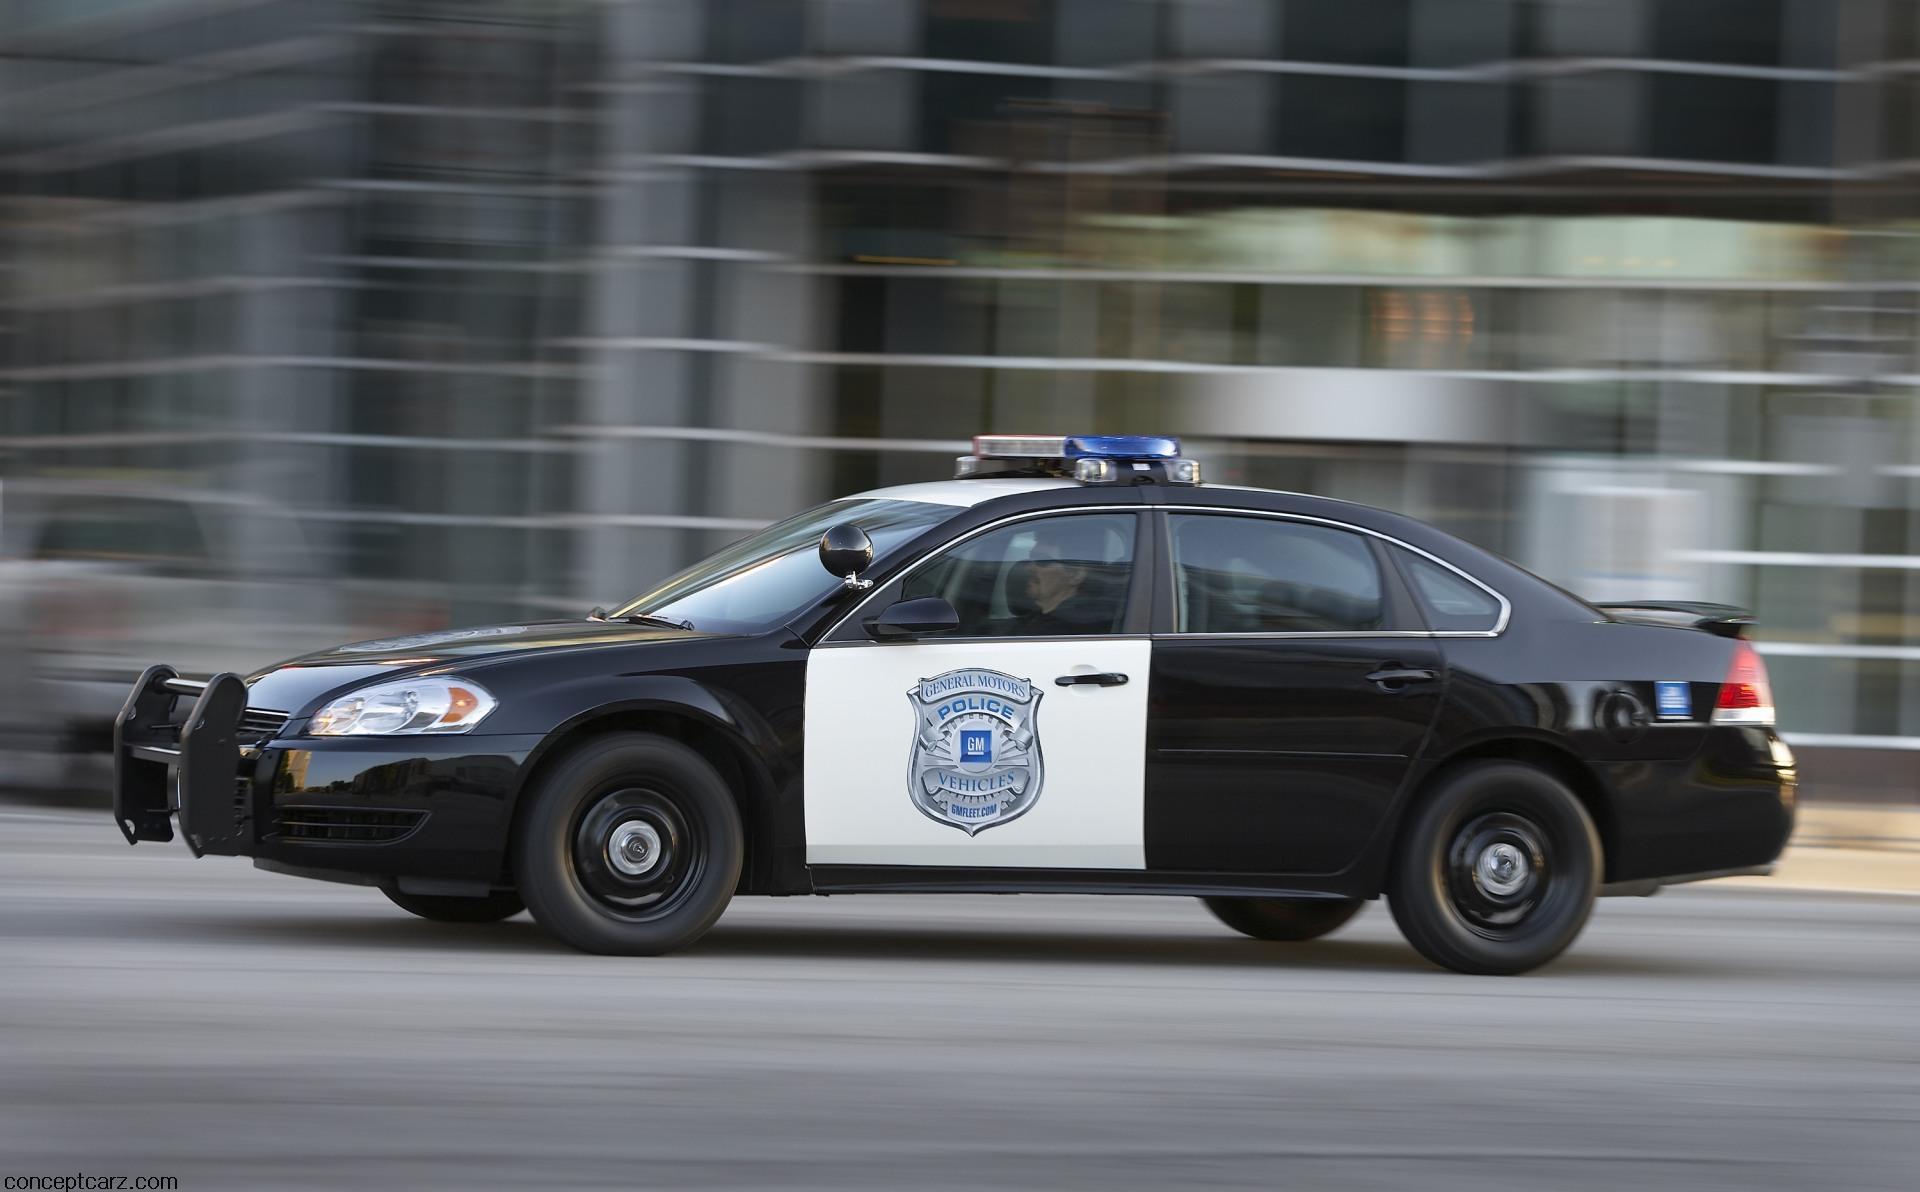 Cop Car Wallpaper 2011 Chevrolet Impala Police Package Conceptcarz Com